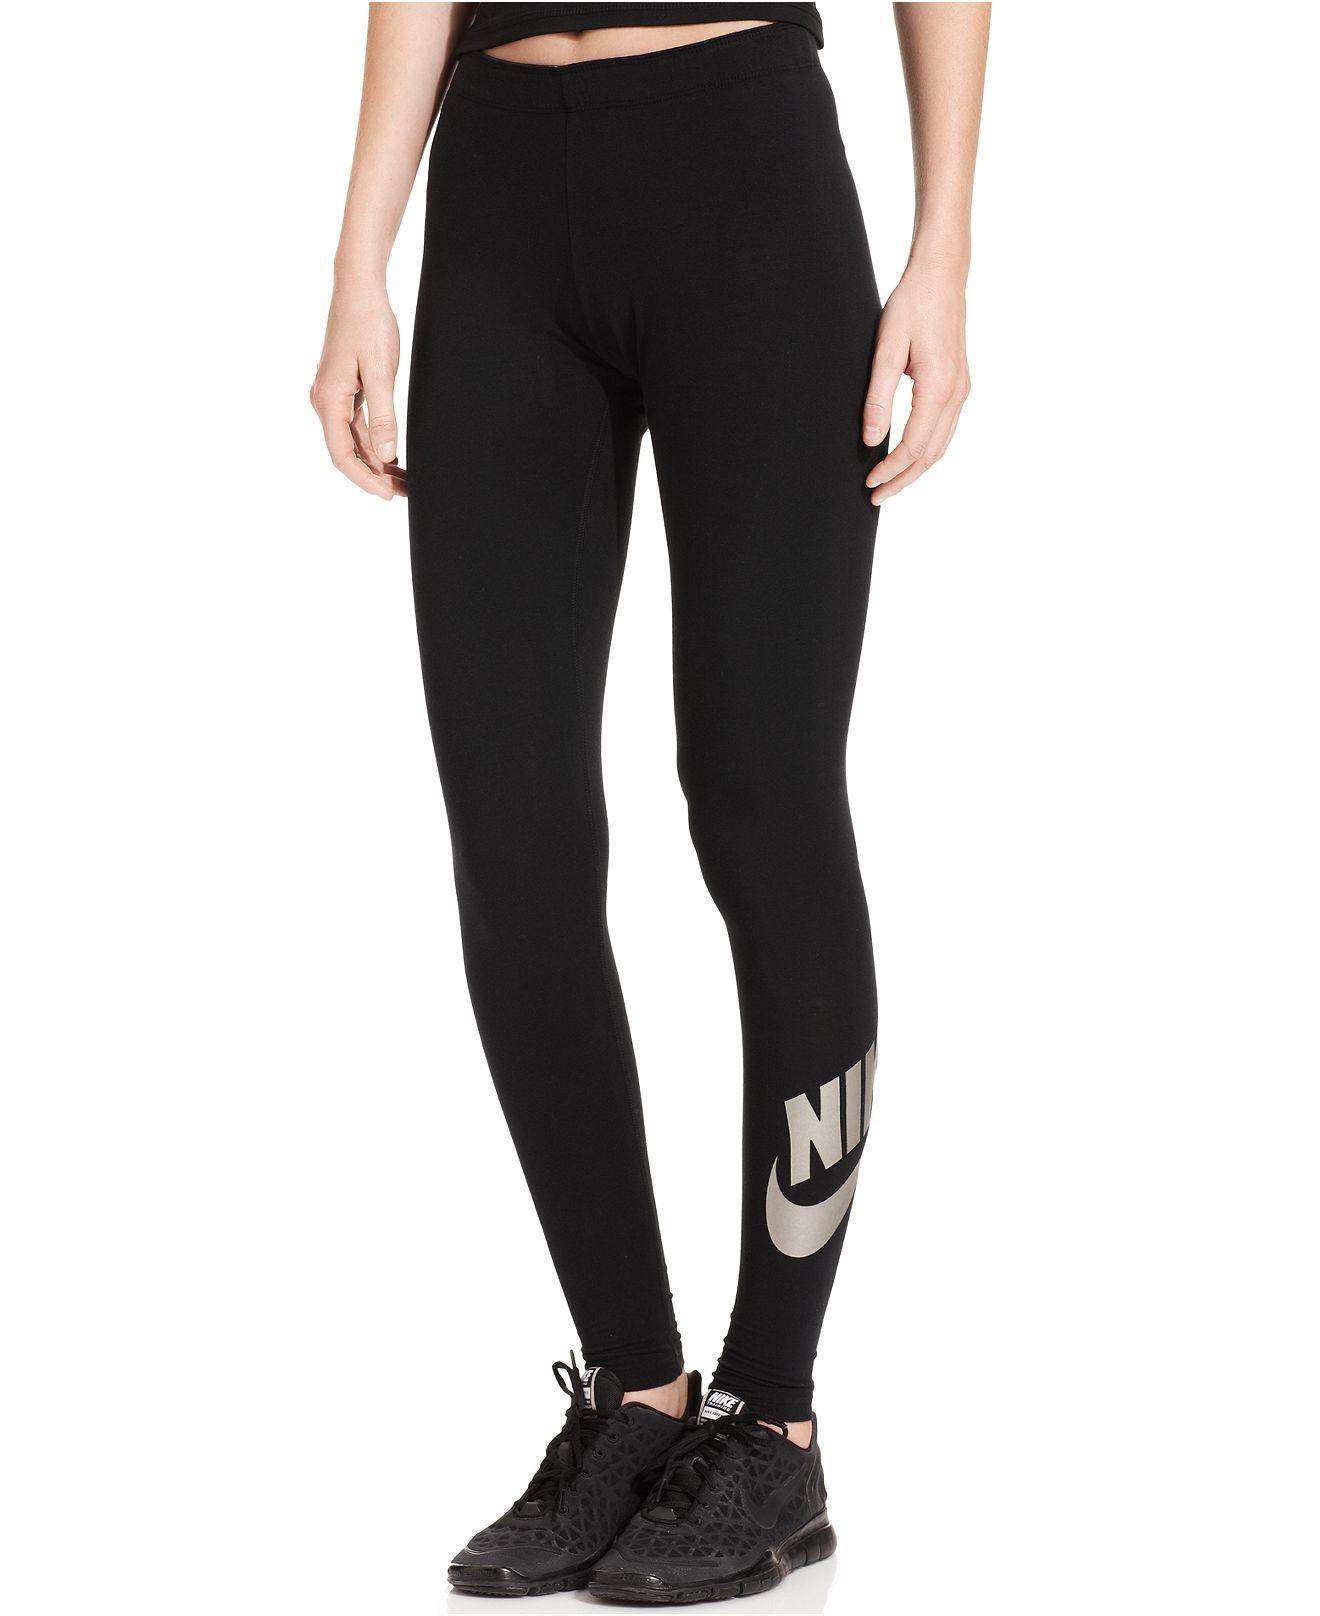 89eeedc79f Nike Leg-A-See Metallic Logo Leggings - Active Pants - Women - Macy s